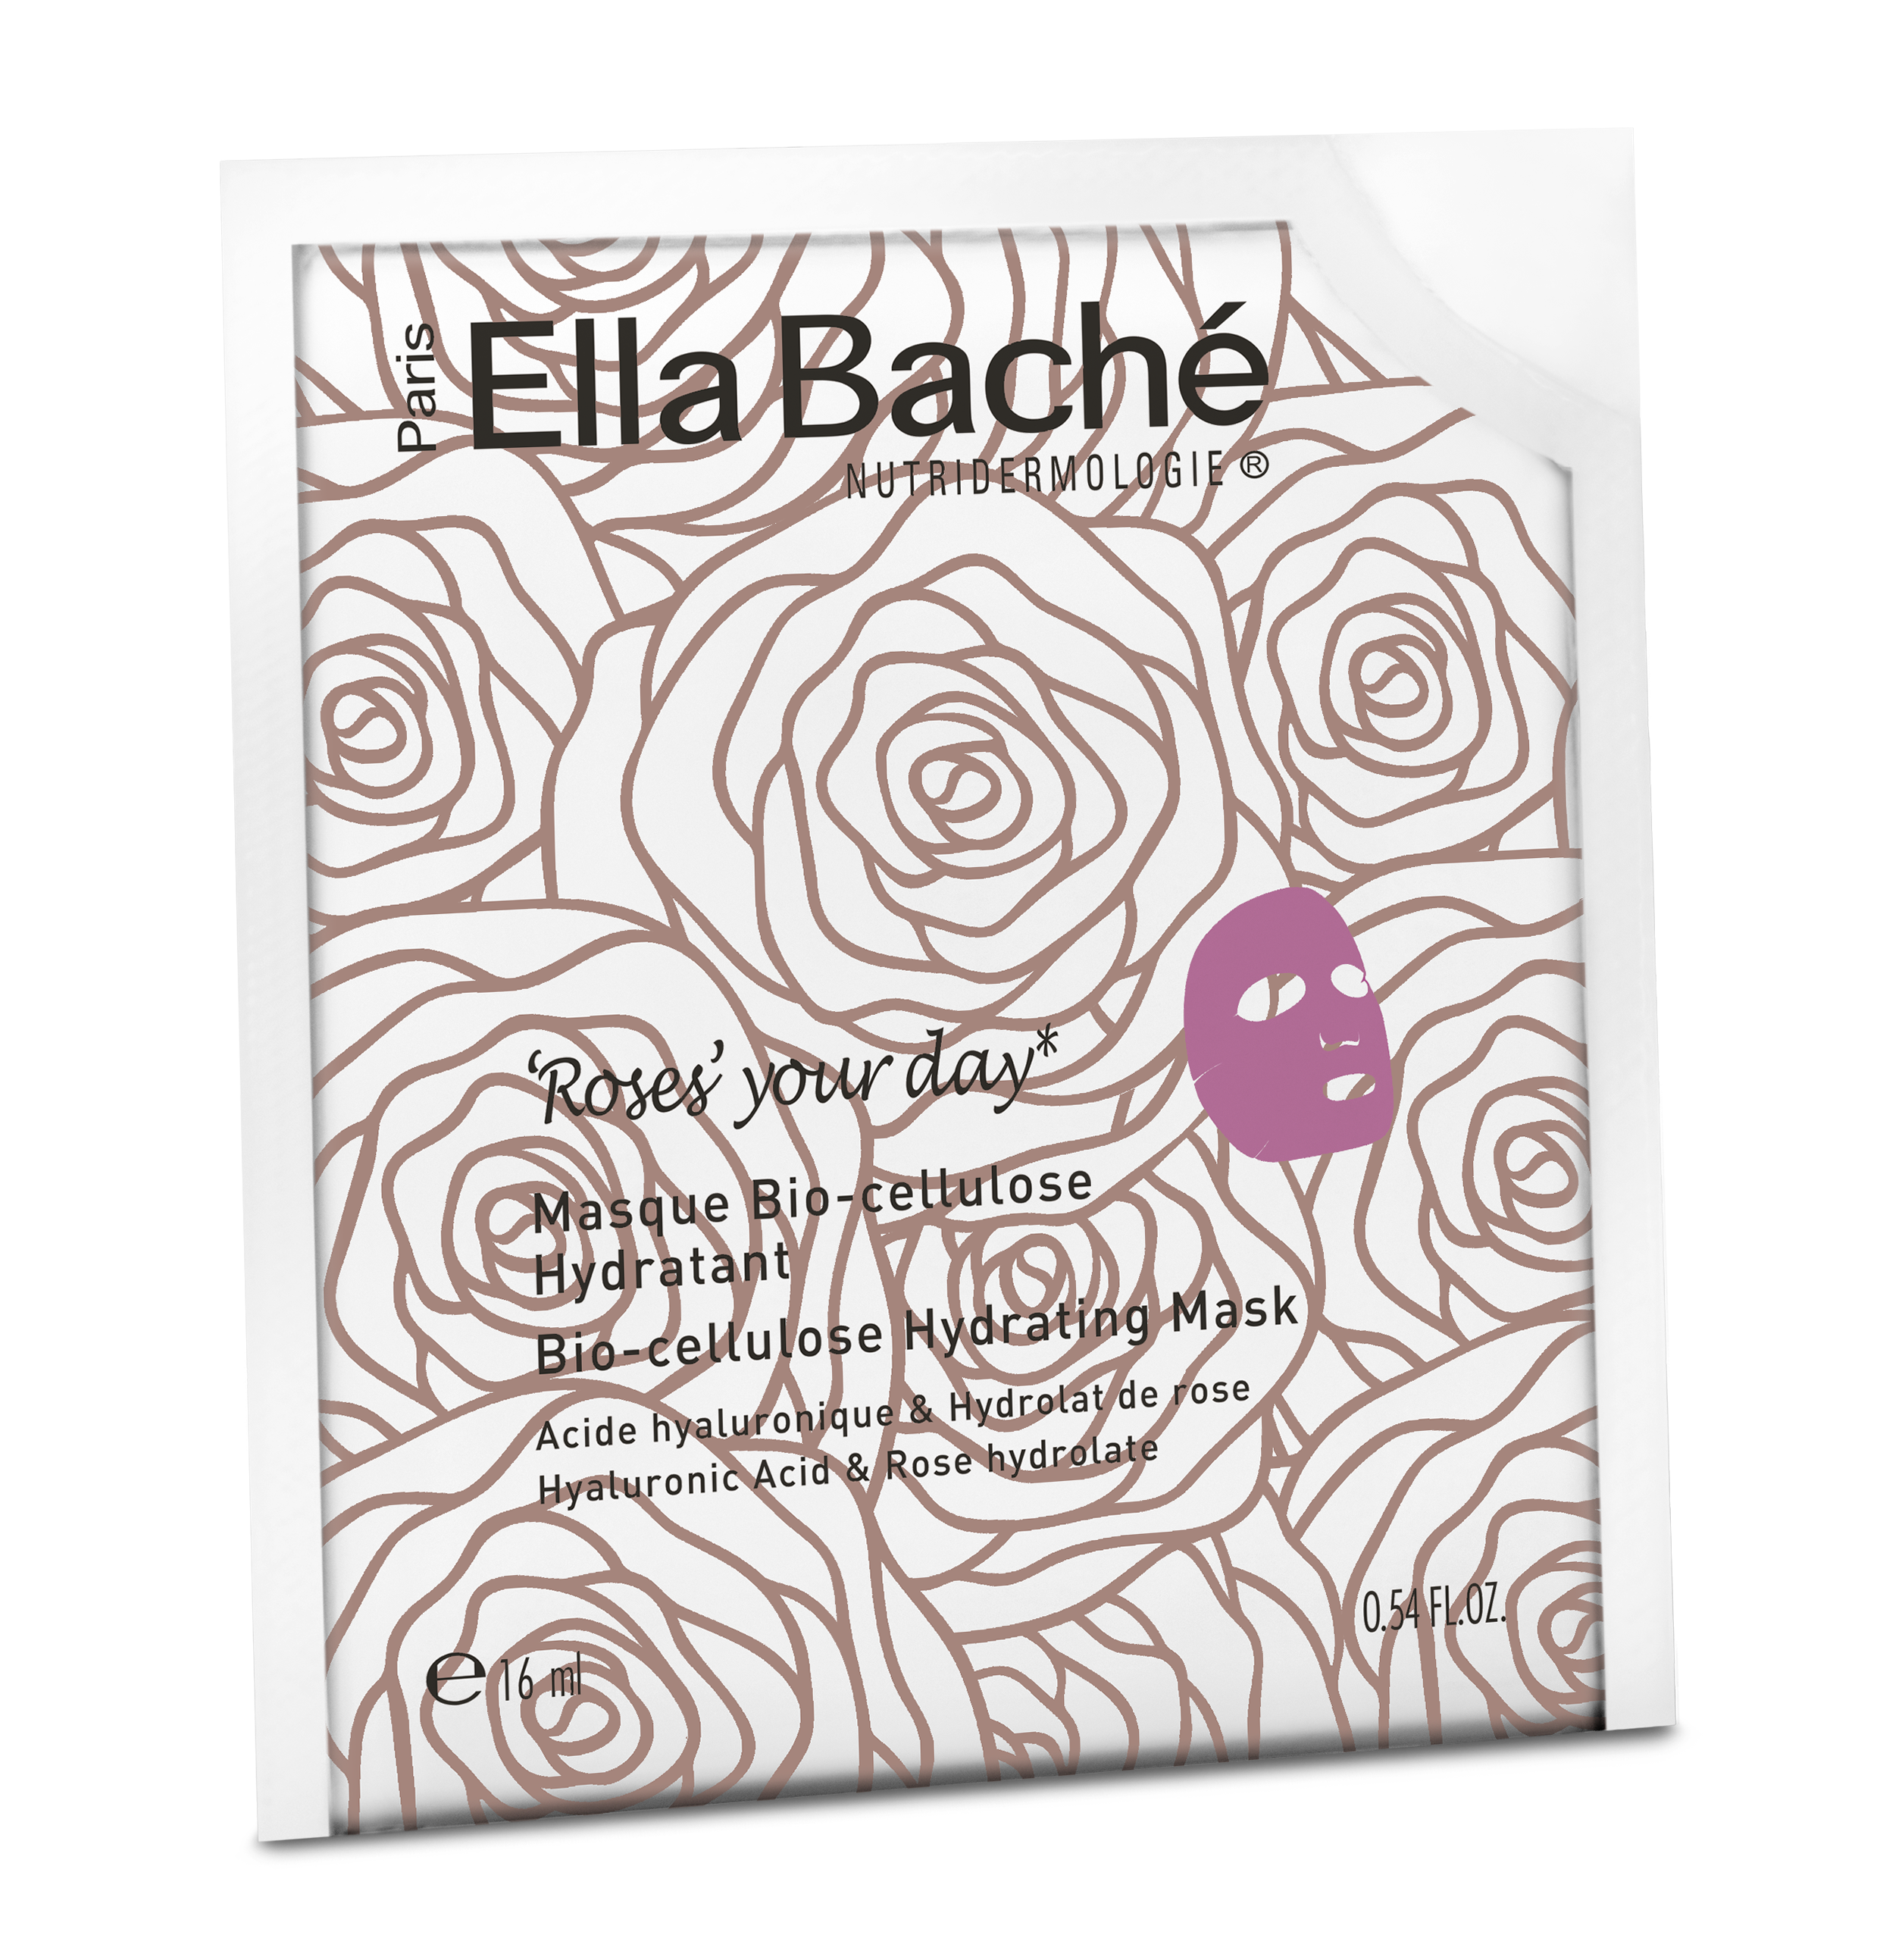 Roses hidra sheet  maska na biocelulozi, box 5 kom